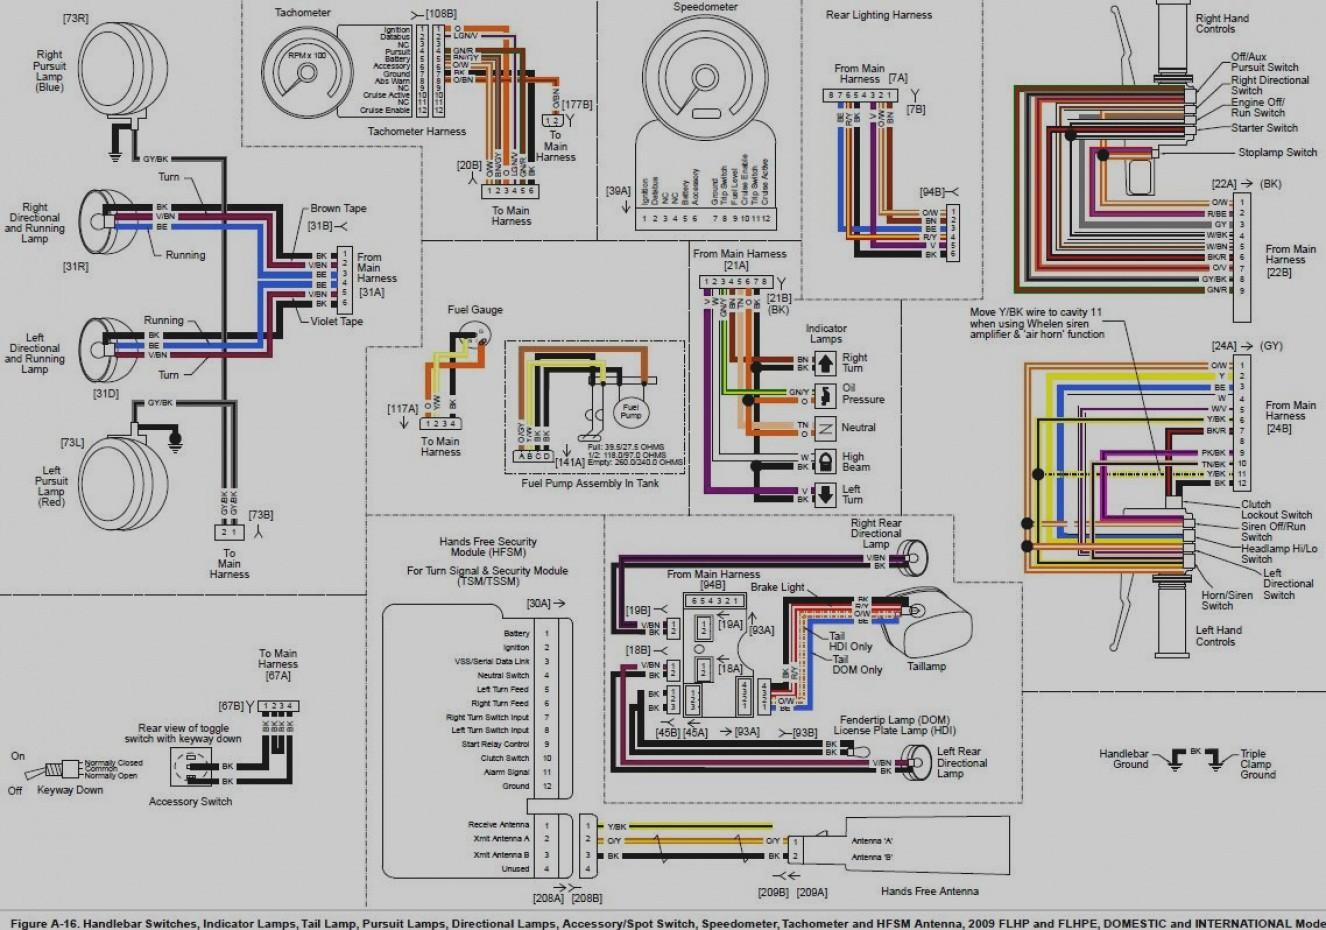 badlands led turn signals wiring diagram harley online wiring diagrambadlands led turn signals wiring diagram harley best wiring librarybadlands led turn signals wiring diagram harley